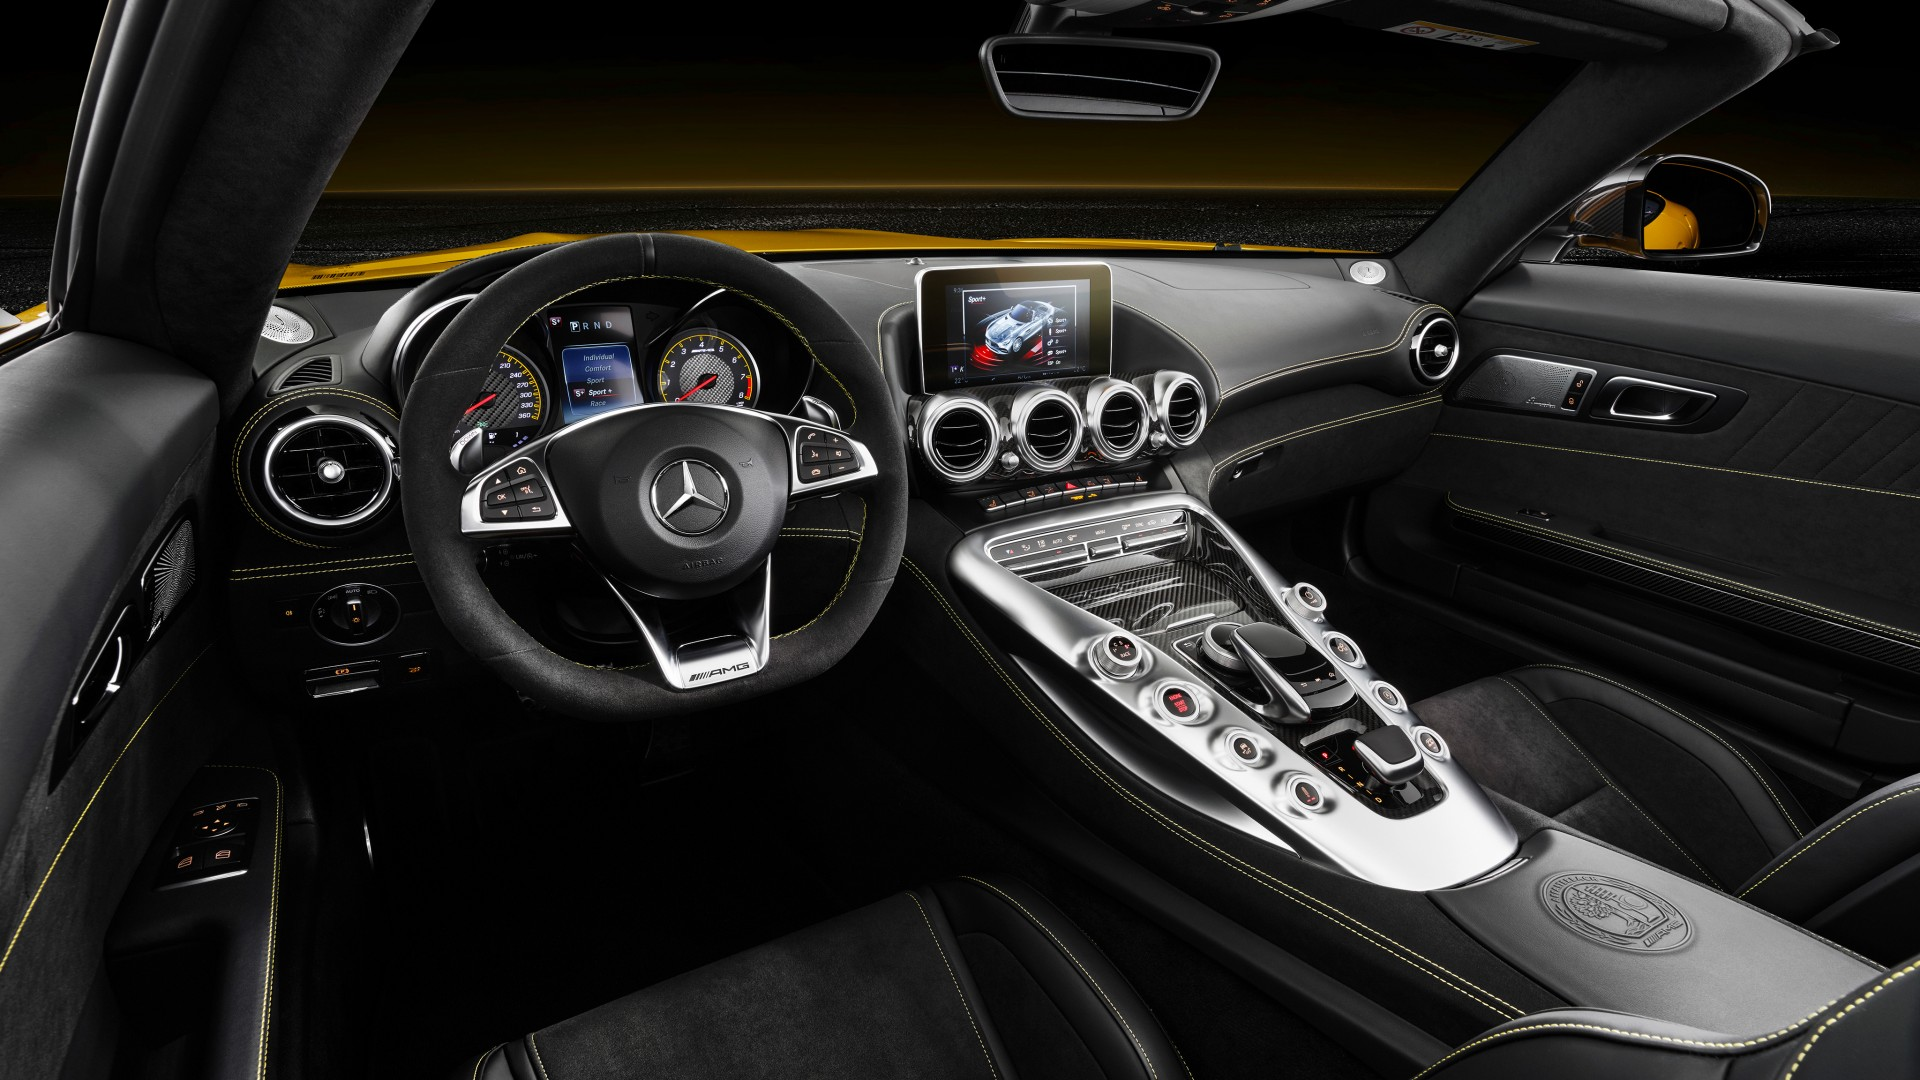 Ford Gt Interior >> 2018 Mercedes-AMG GT S Roadster 4K Interior Wallpaper | HD ...